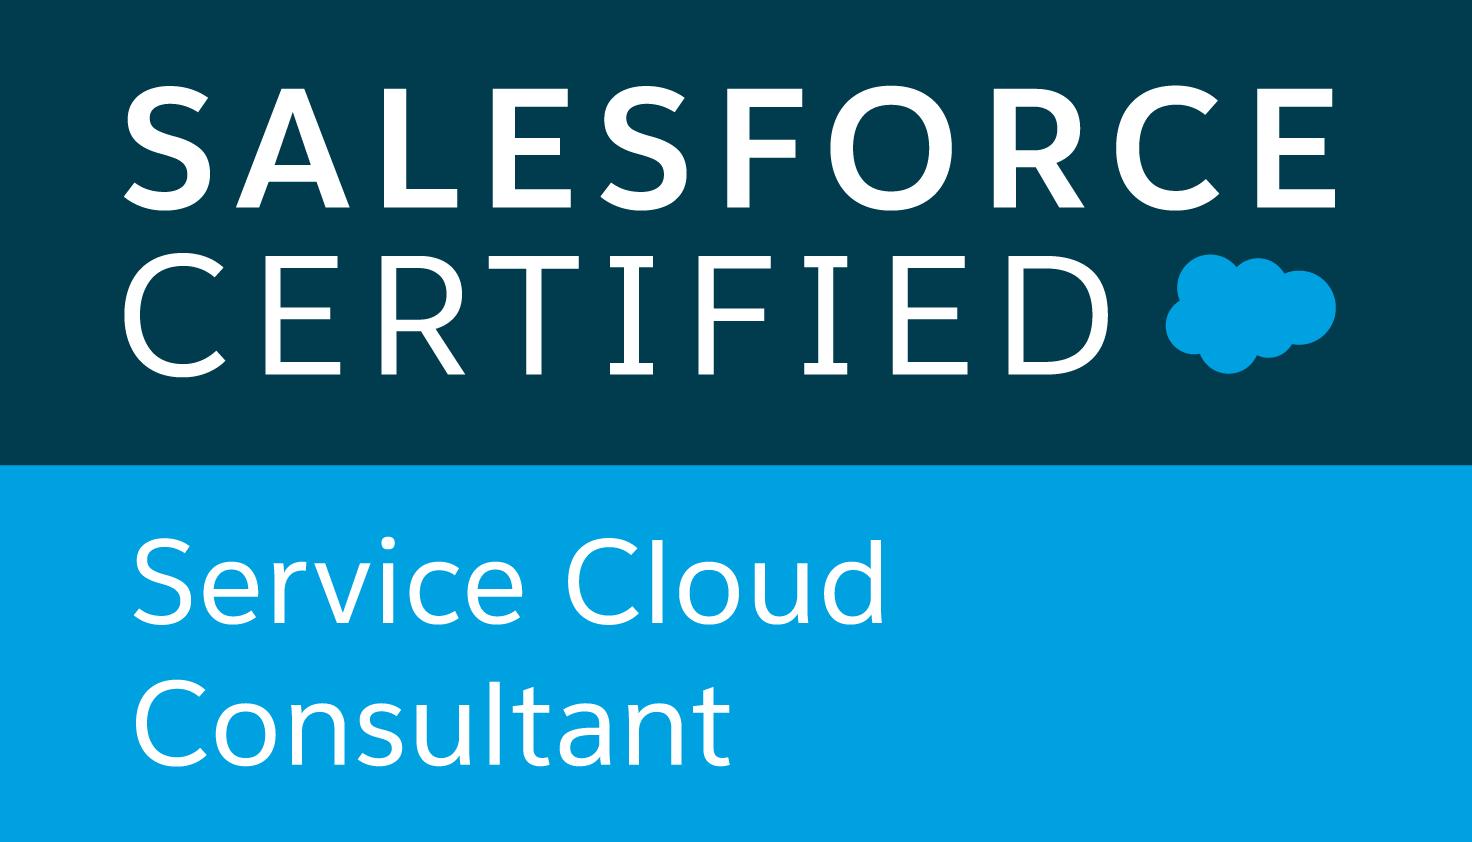 Service Cloud Consultant